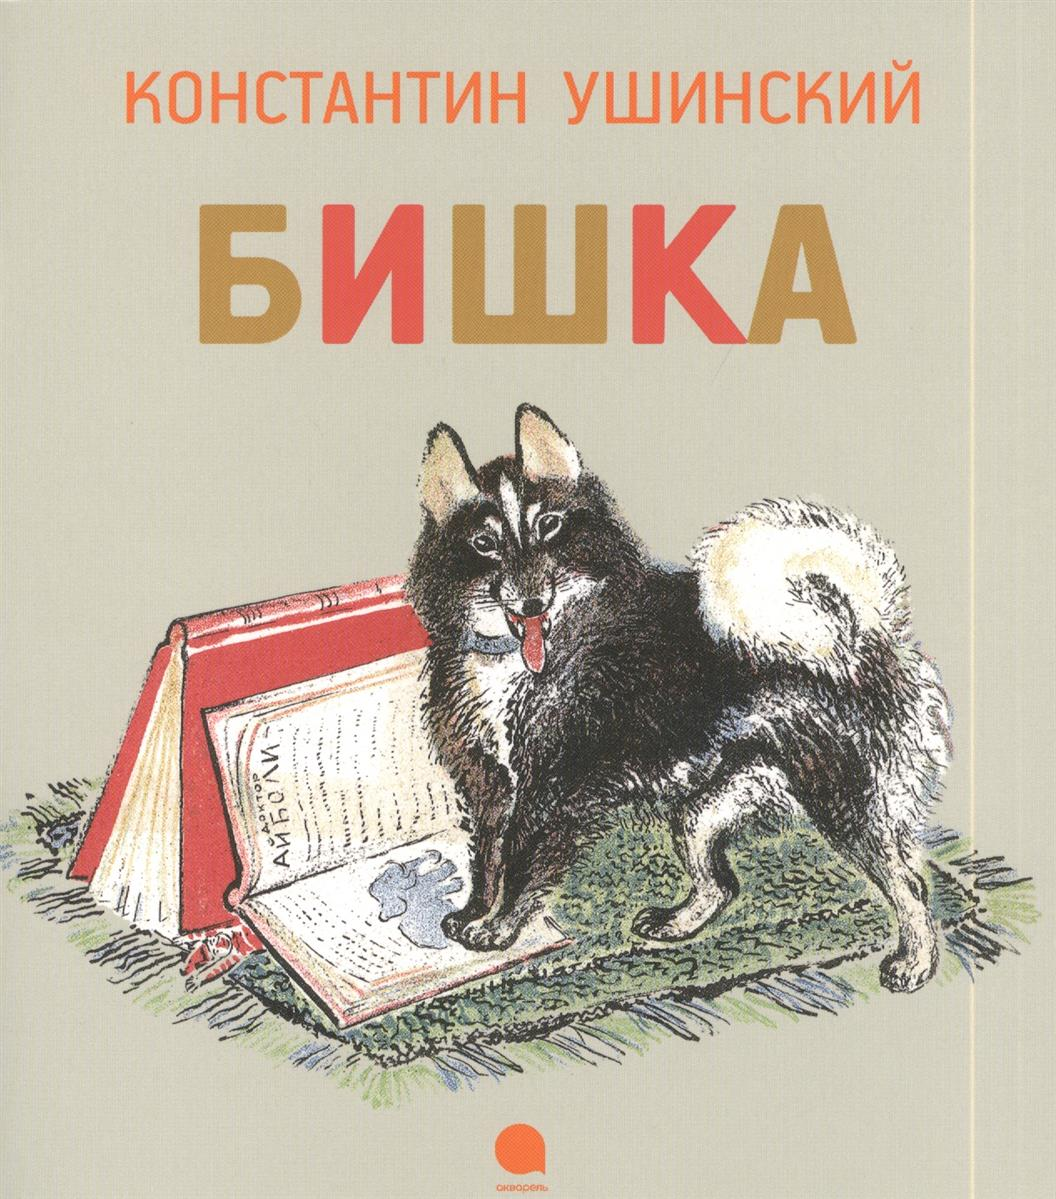 Ушинский К. Бишка